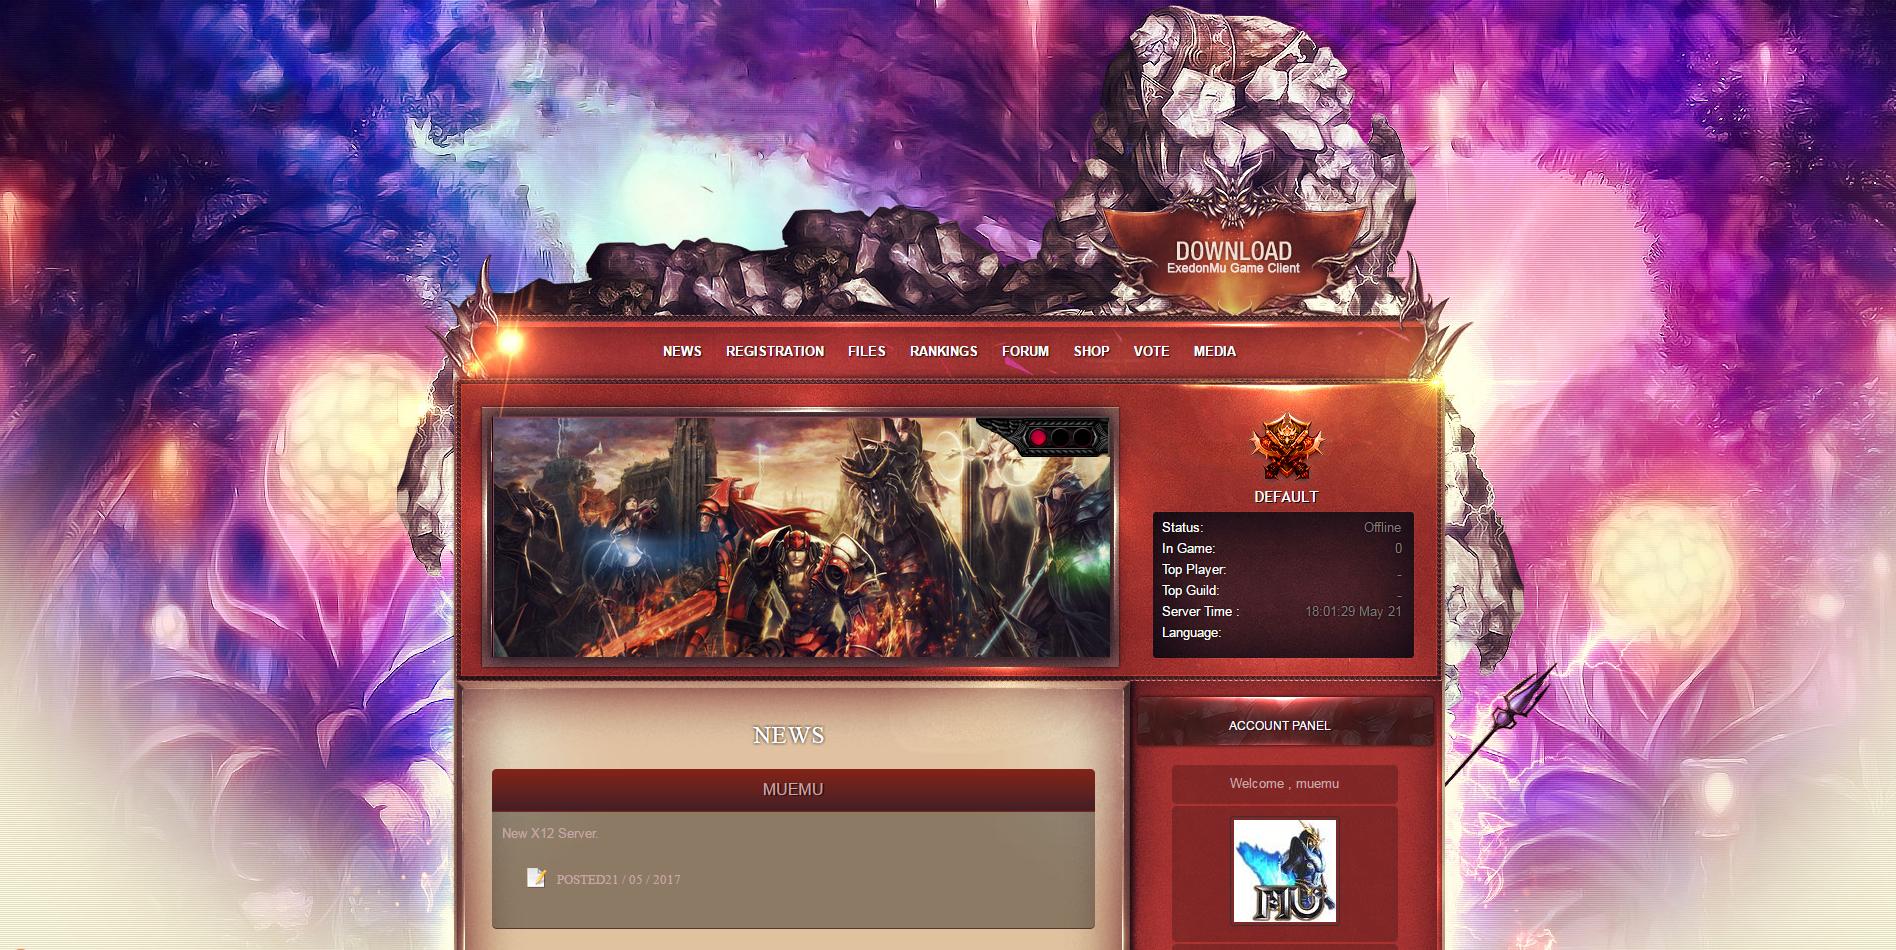 Pack DMN CMS Compativel com Mu Online Season 14 - Como criar servidor de Mu Online Season 14 WebZen, criar Mu Online, como jogar mu online season 14